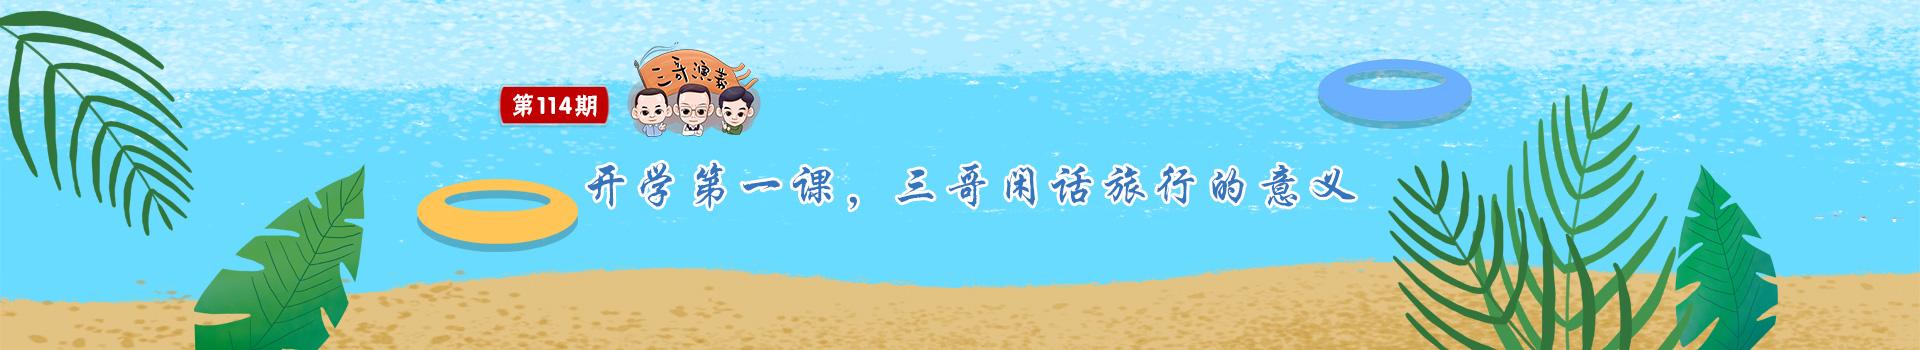 No.114三哥演义